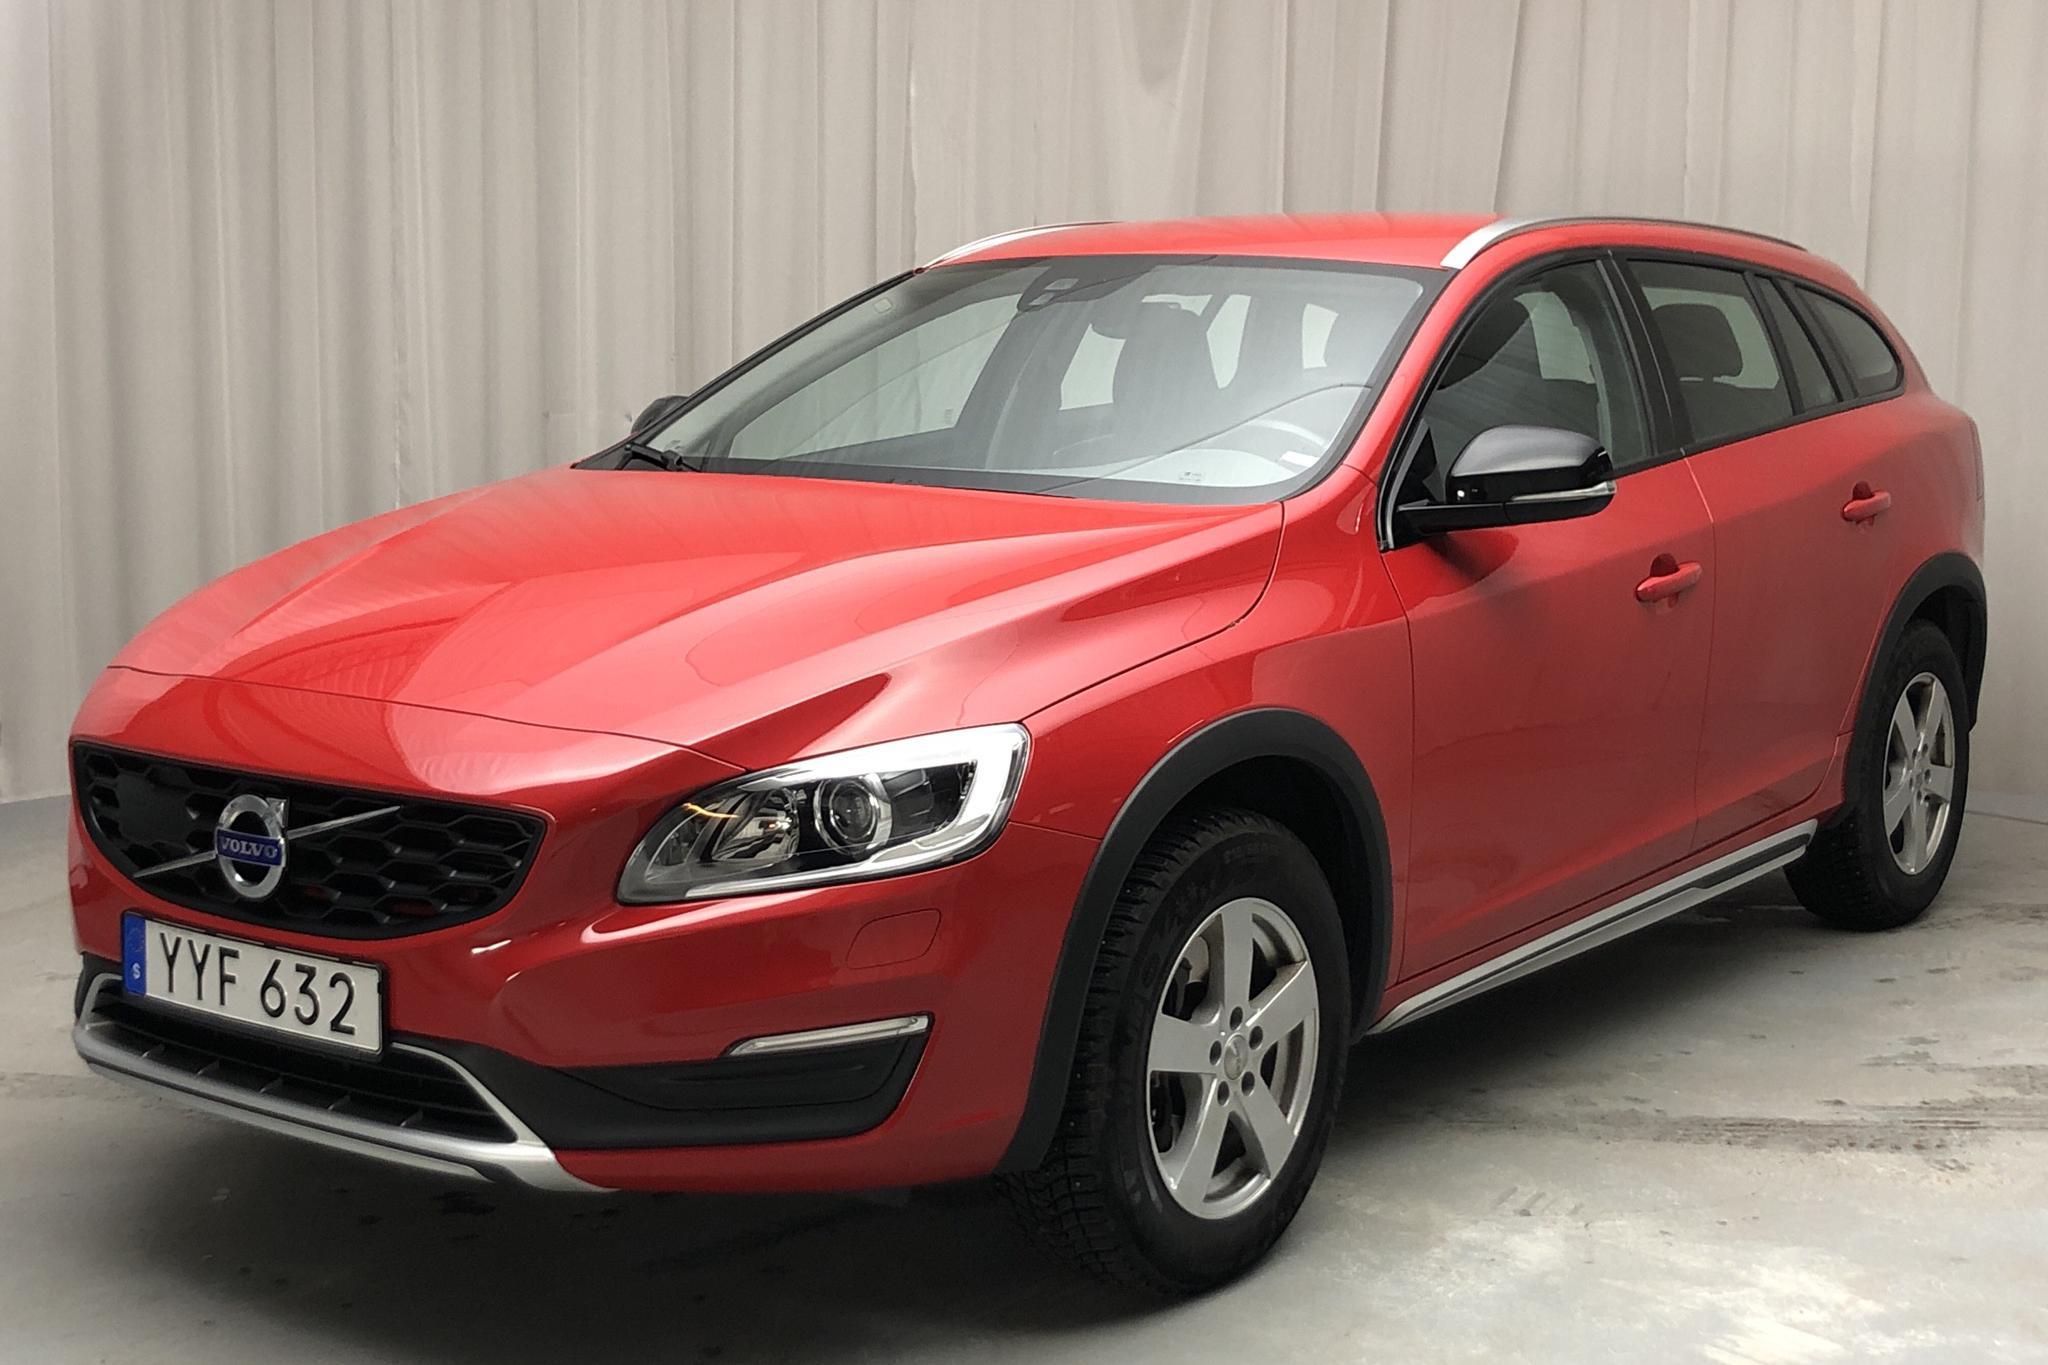 Volvo V60 D4 Cross Country (190hk) - 5 819 mil - Manuell - röd - 2018